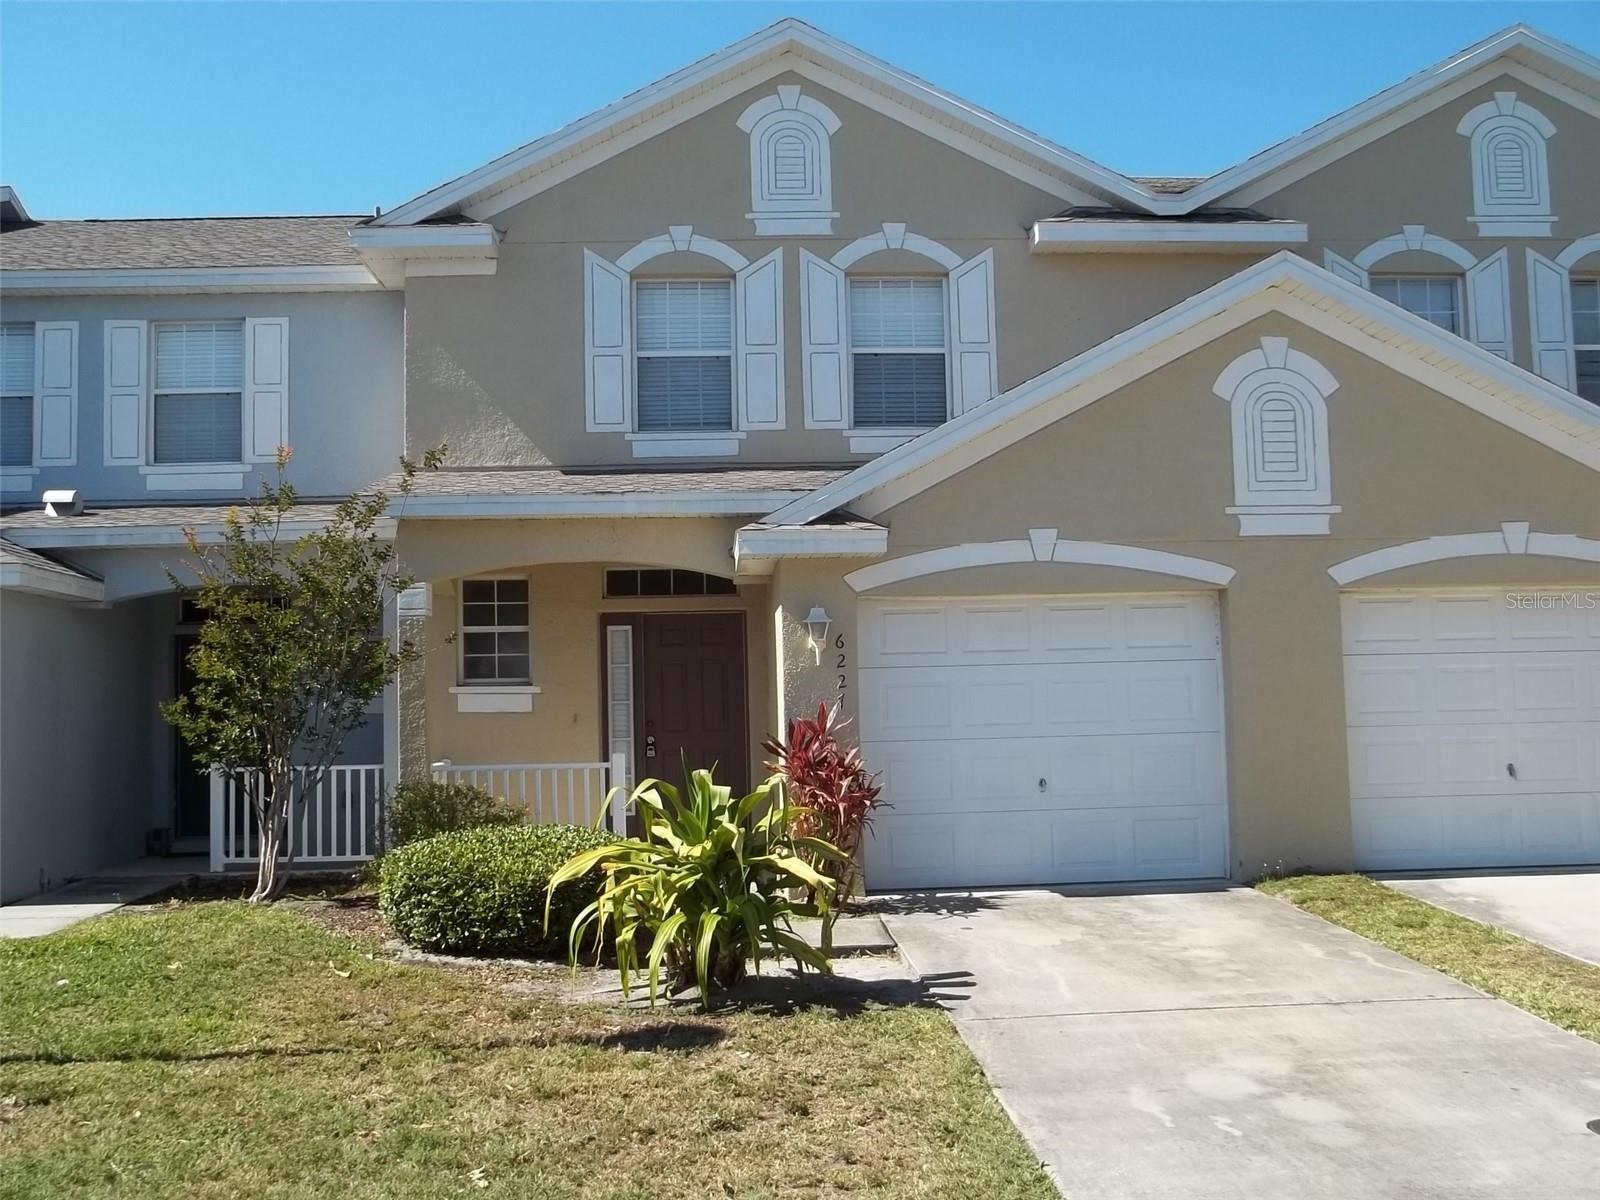 6227 OLIVEDALE DRIVE, Riverview, FL 33578 - MLS#: T3309546